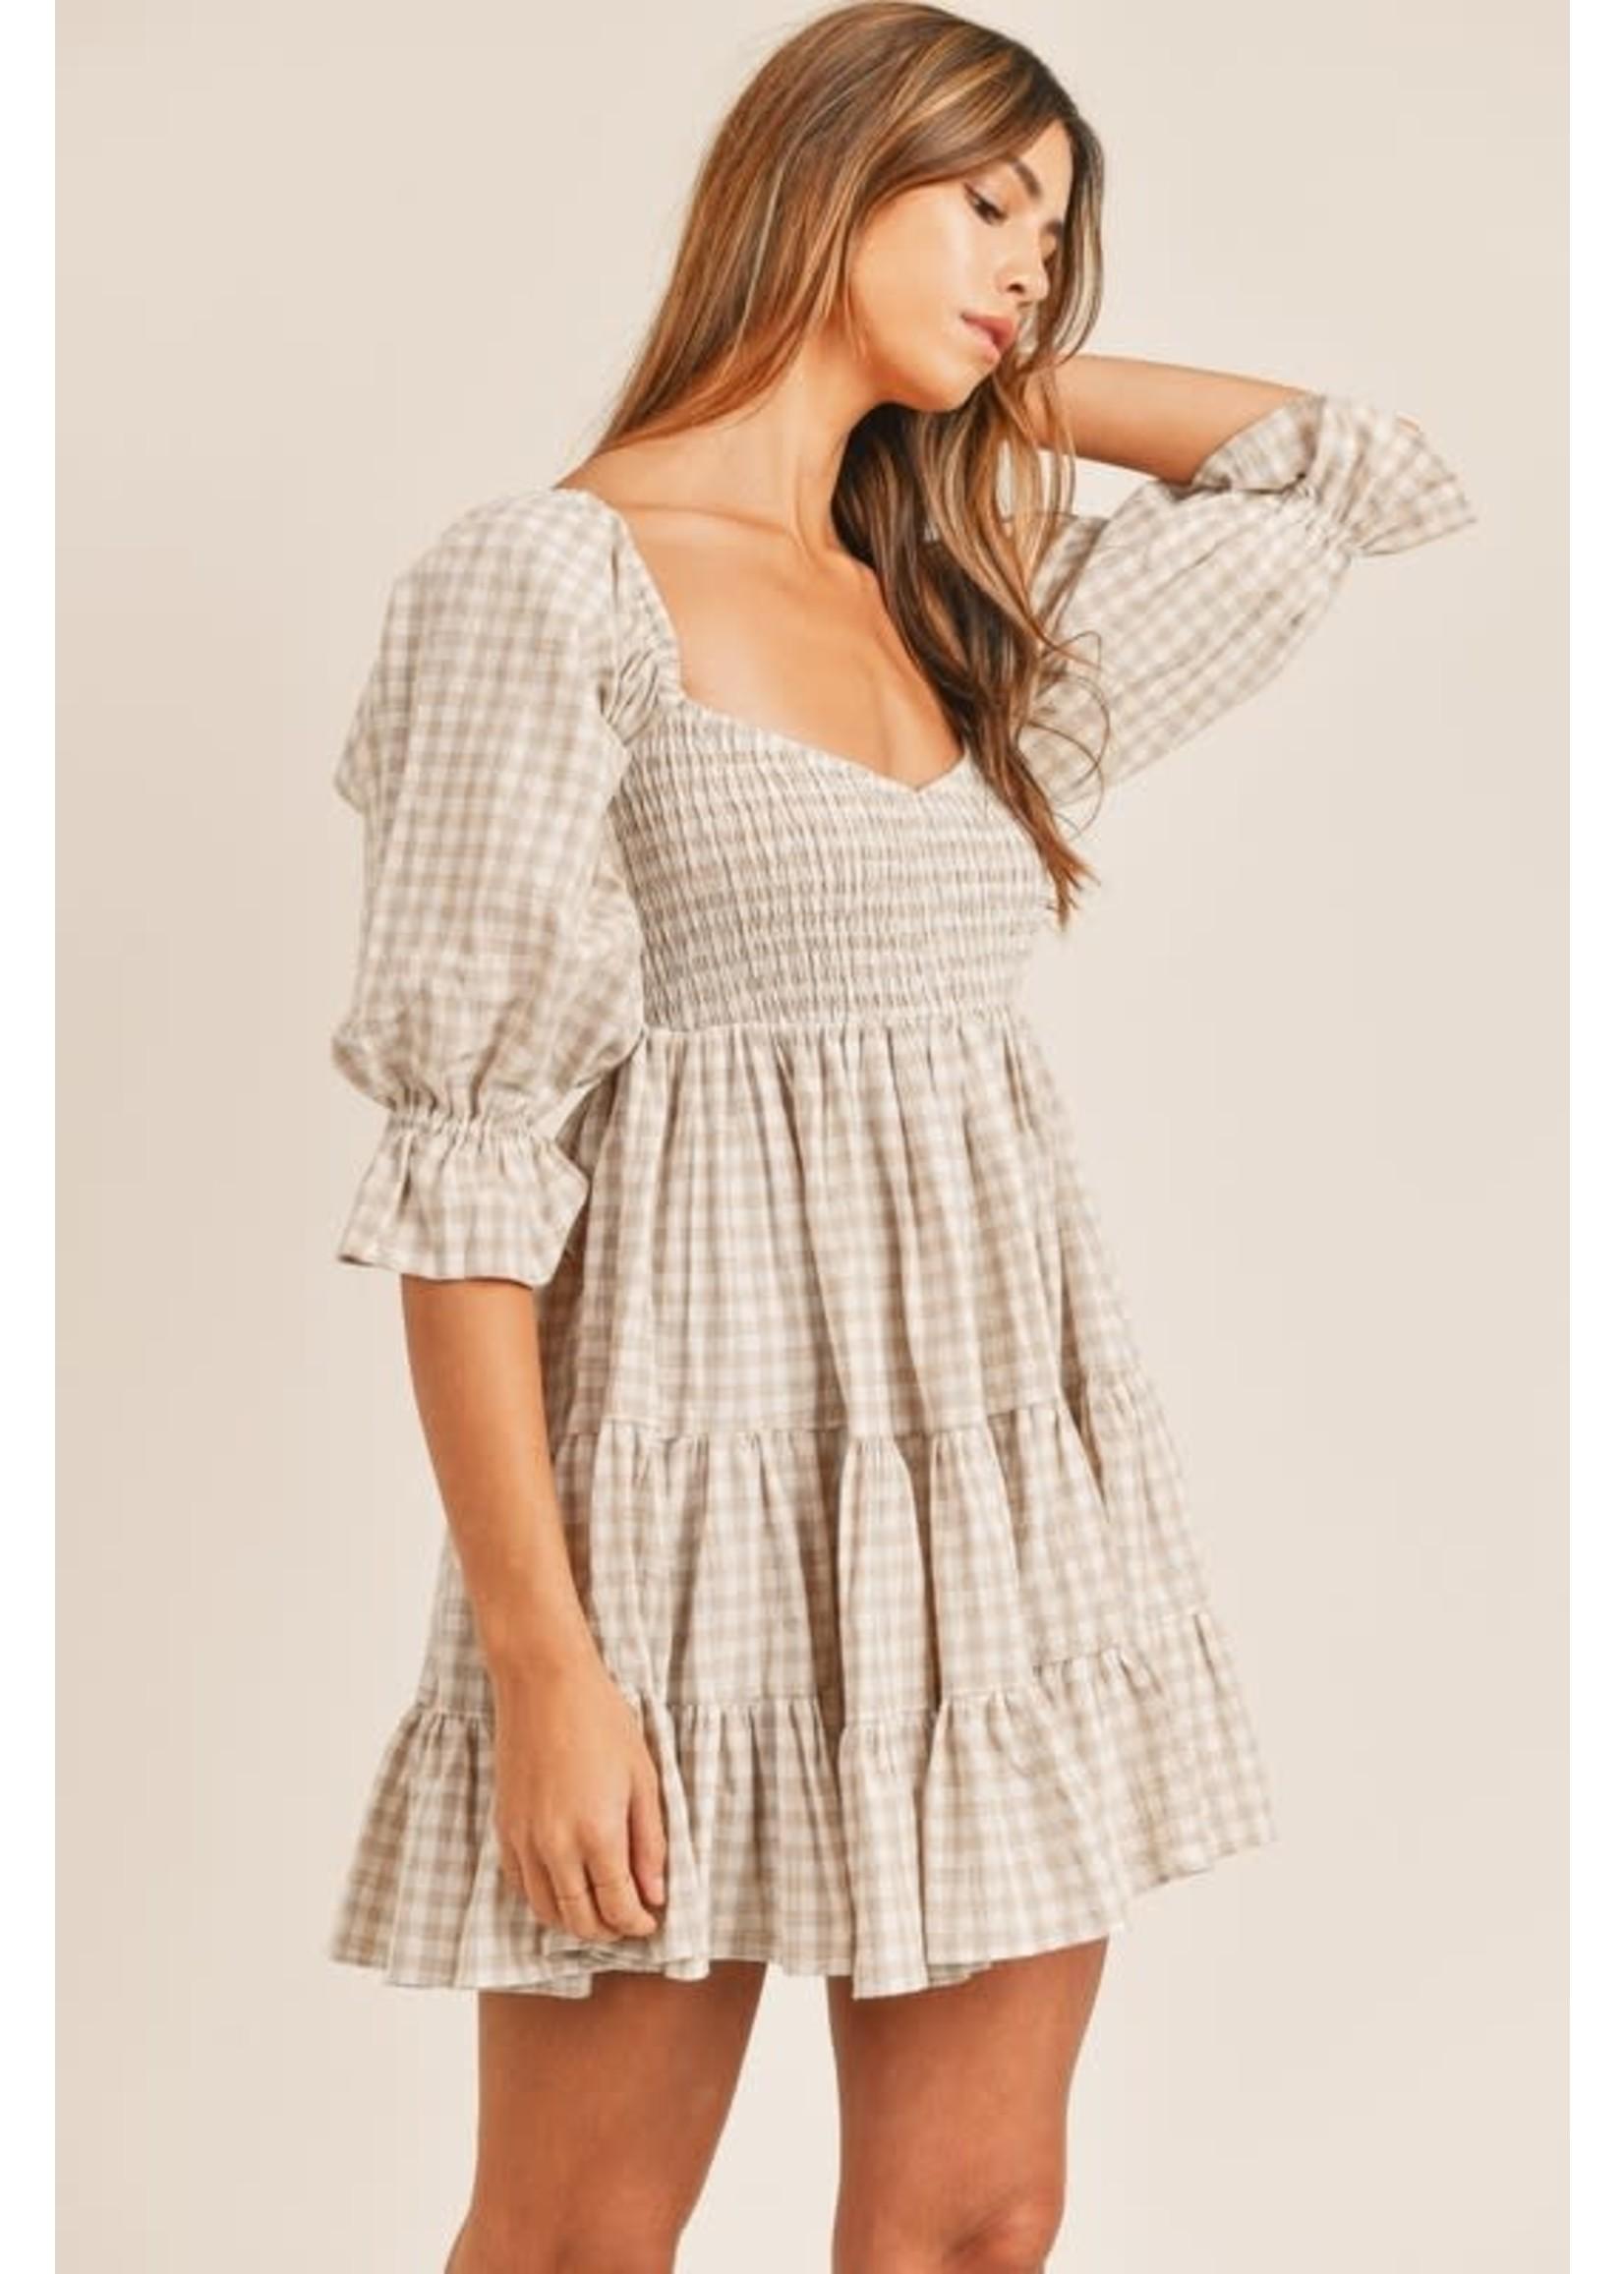 Mable Gingham Ruffled Babydoll Dress - MD2501B